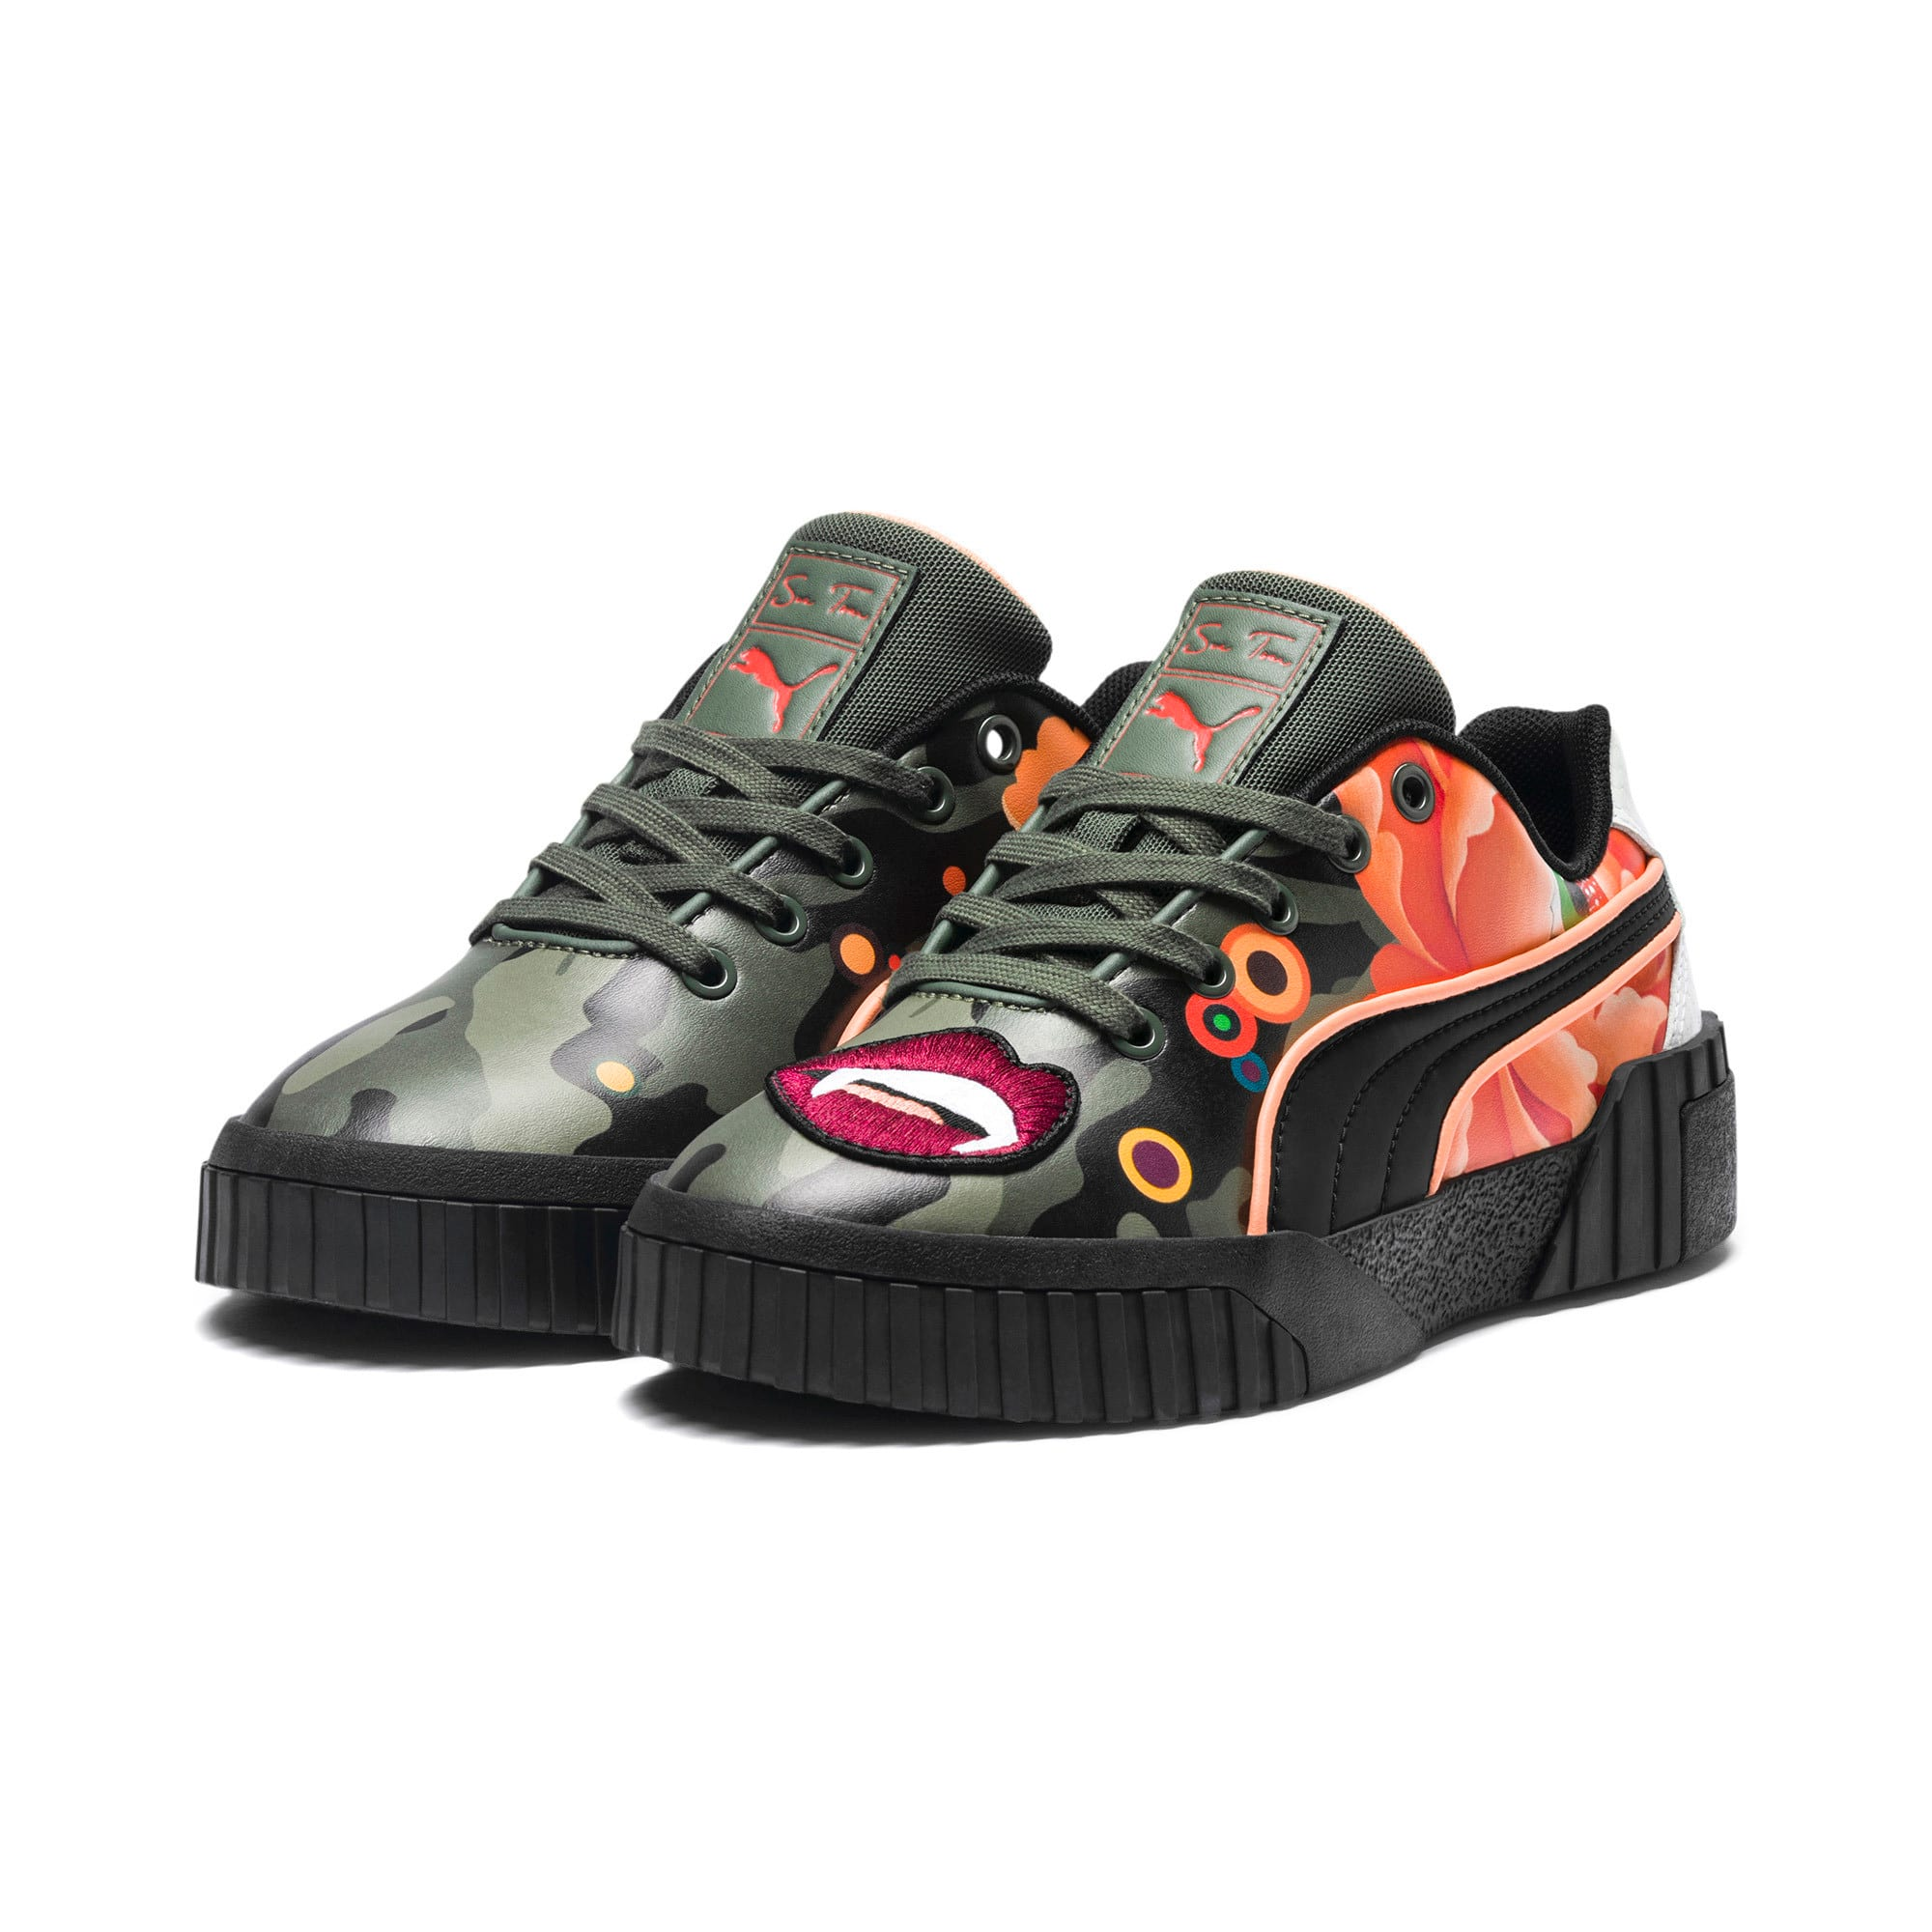 Thumbnail 3 of PUMA x SUE TSAI Cali 'Peonies Camo' Women's Sneakers, Puma Black-Puma Black, medium